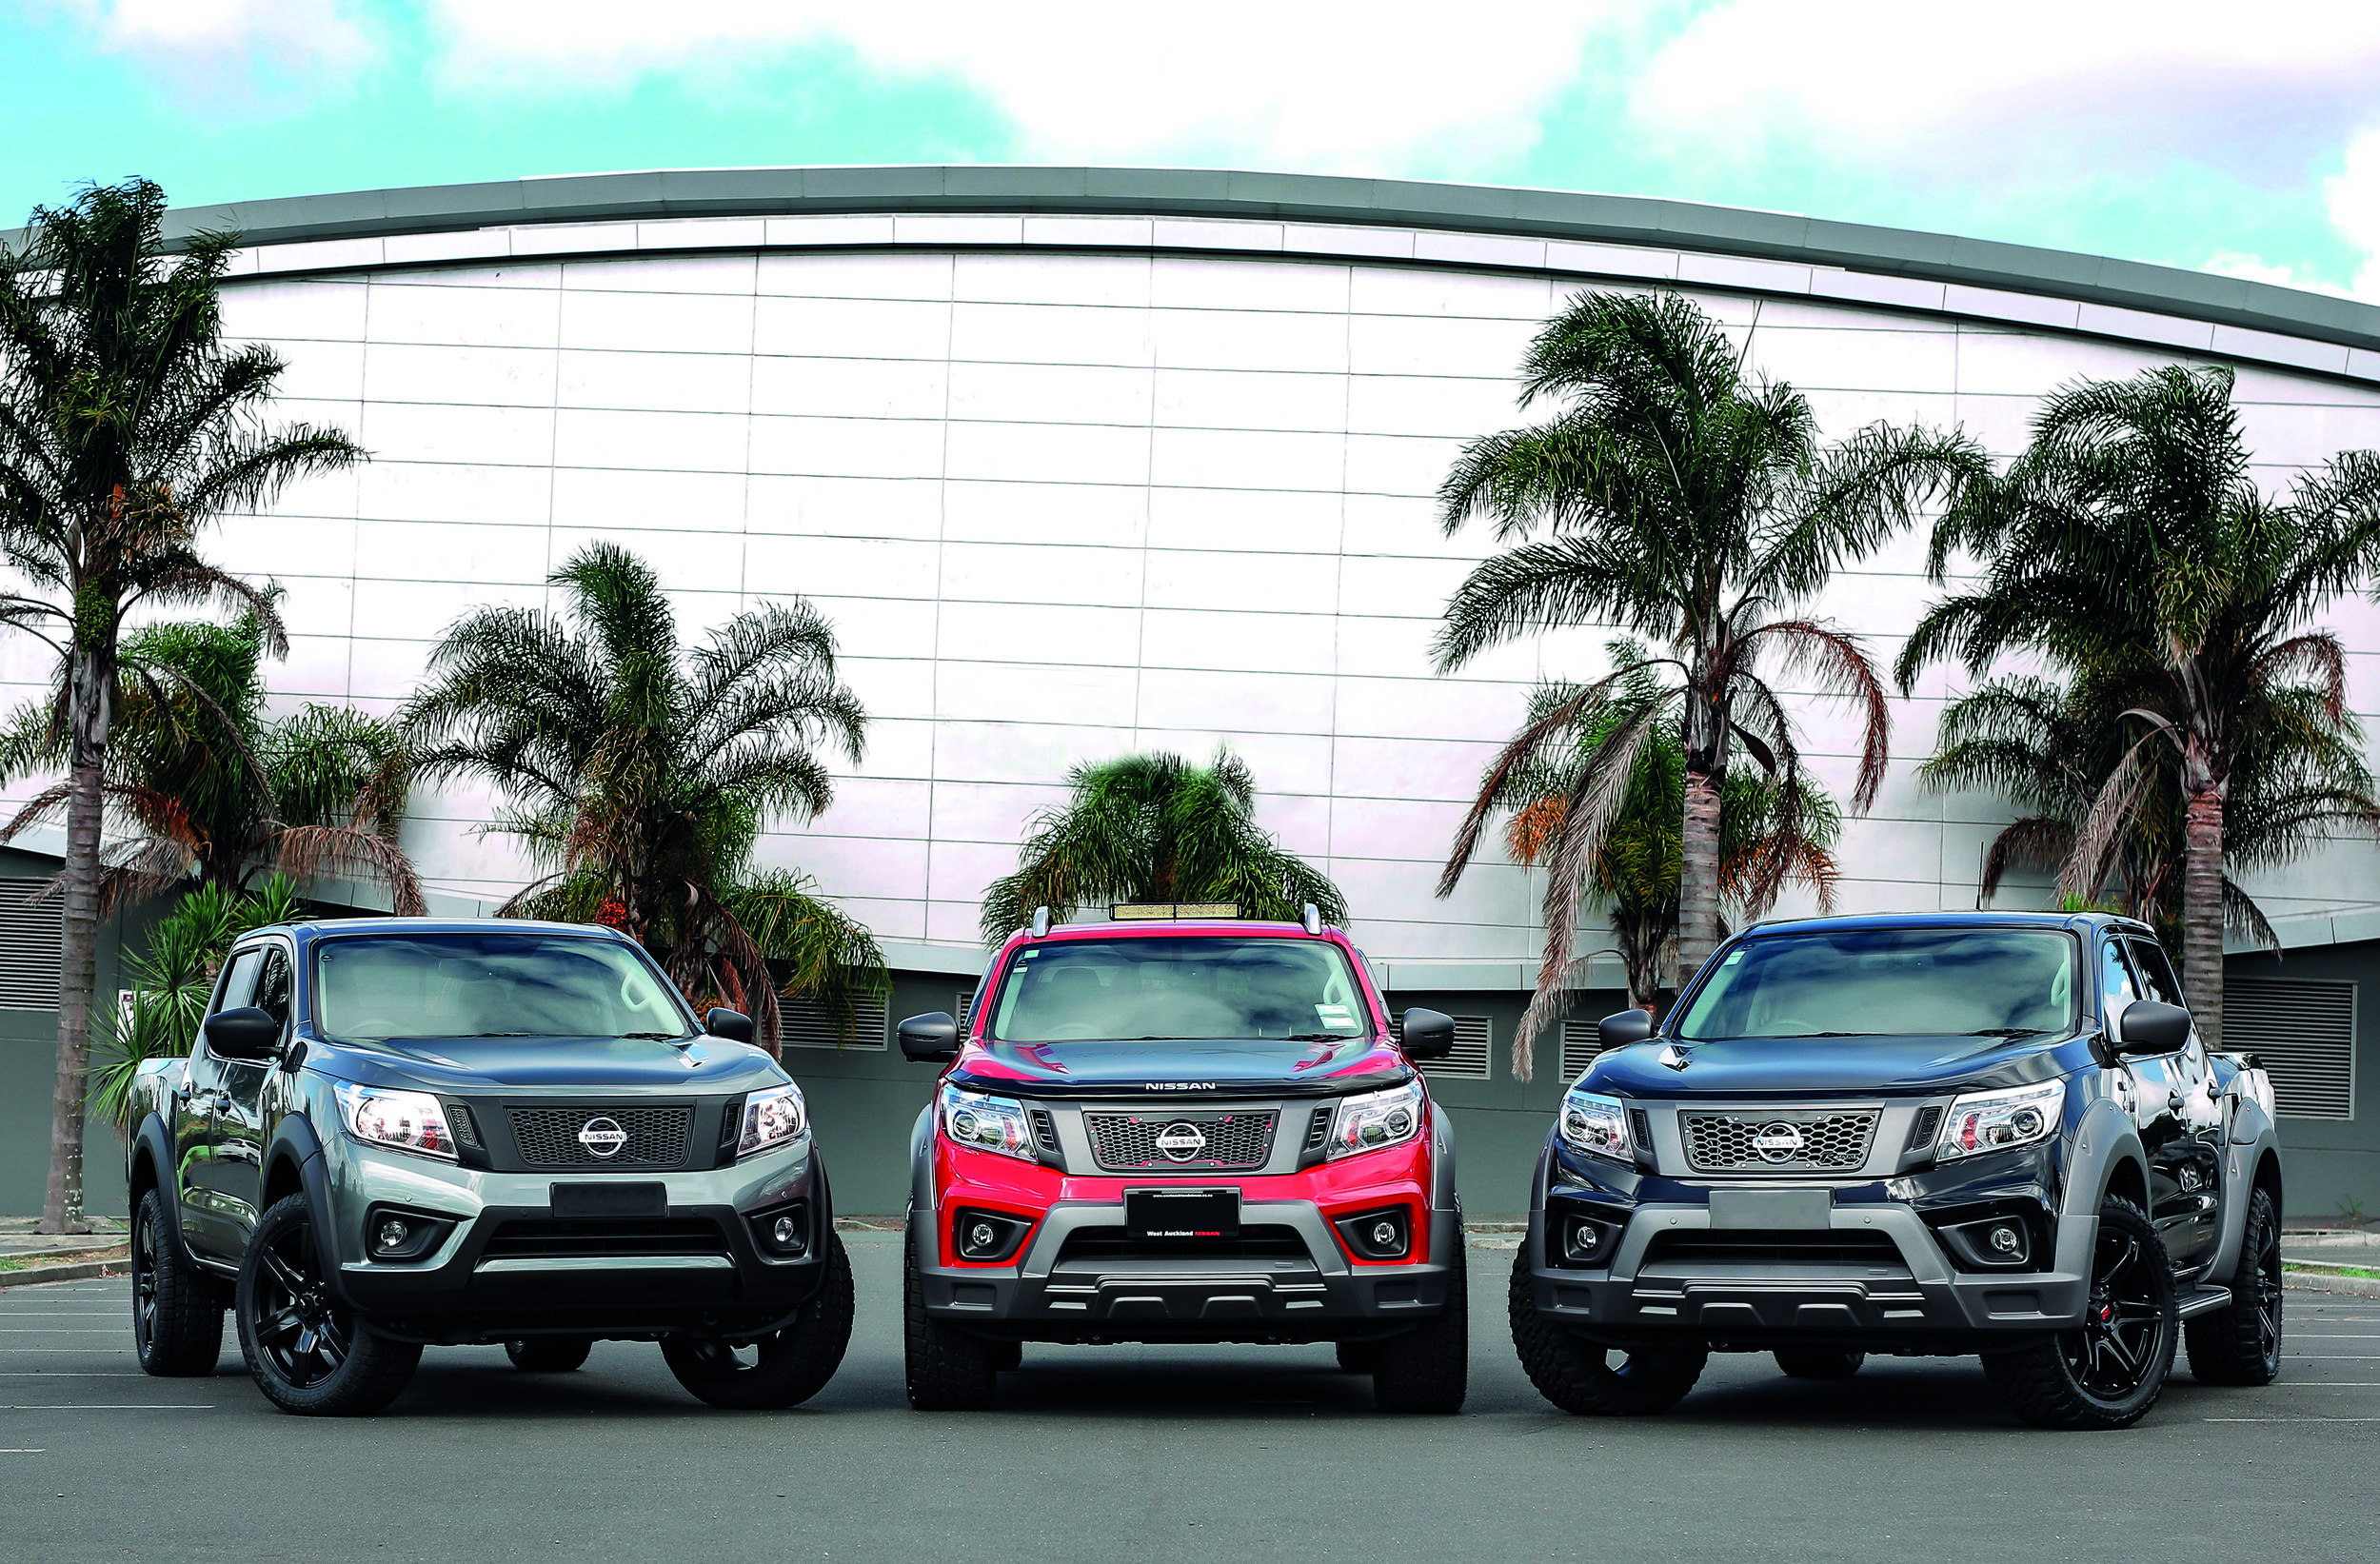 RVE-Nissan-Navara-three-vehicles-showing-different-front-grills.jpg